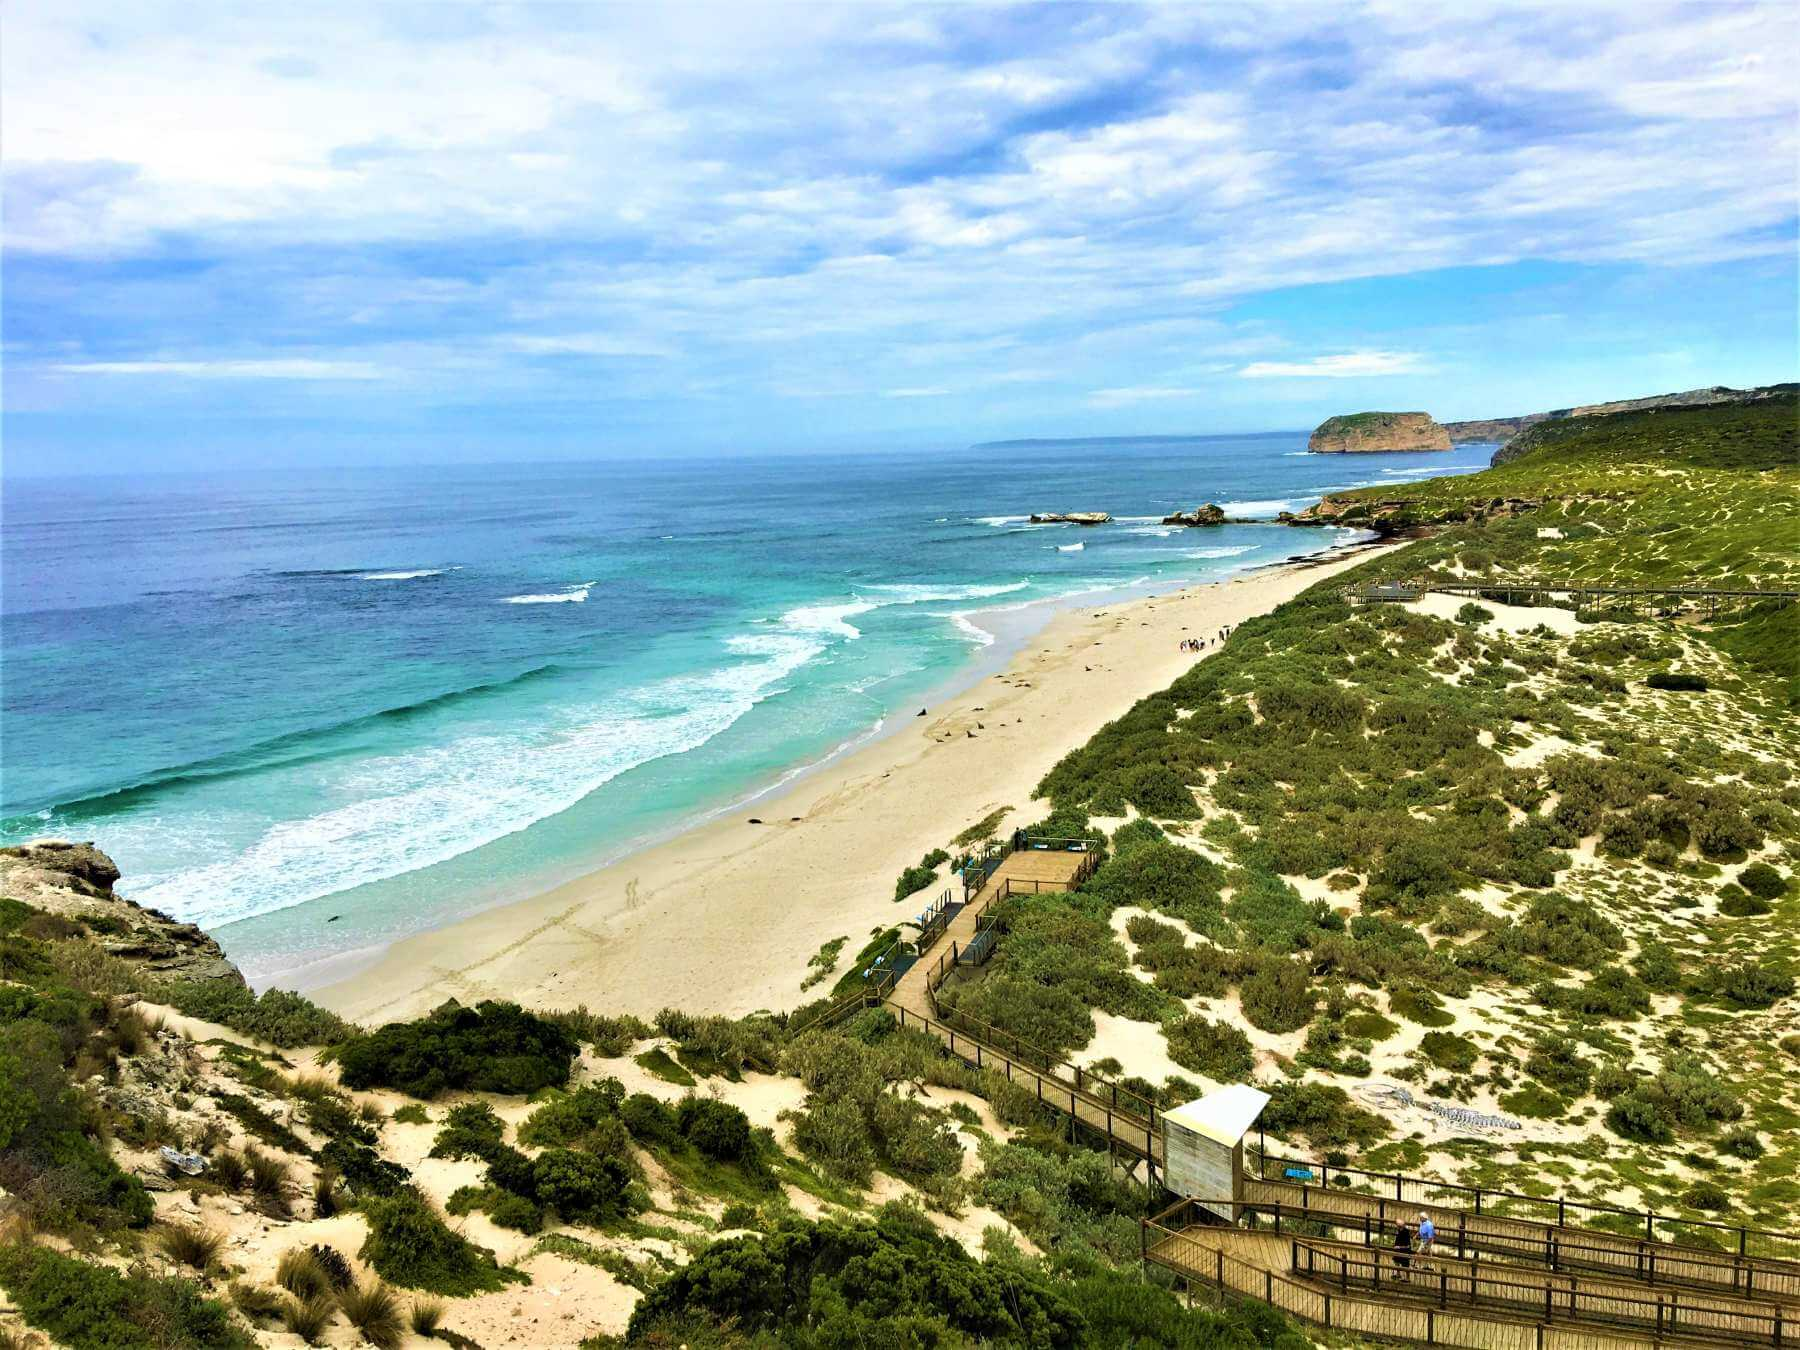 Strand auf Kangaroo Island - Must-See